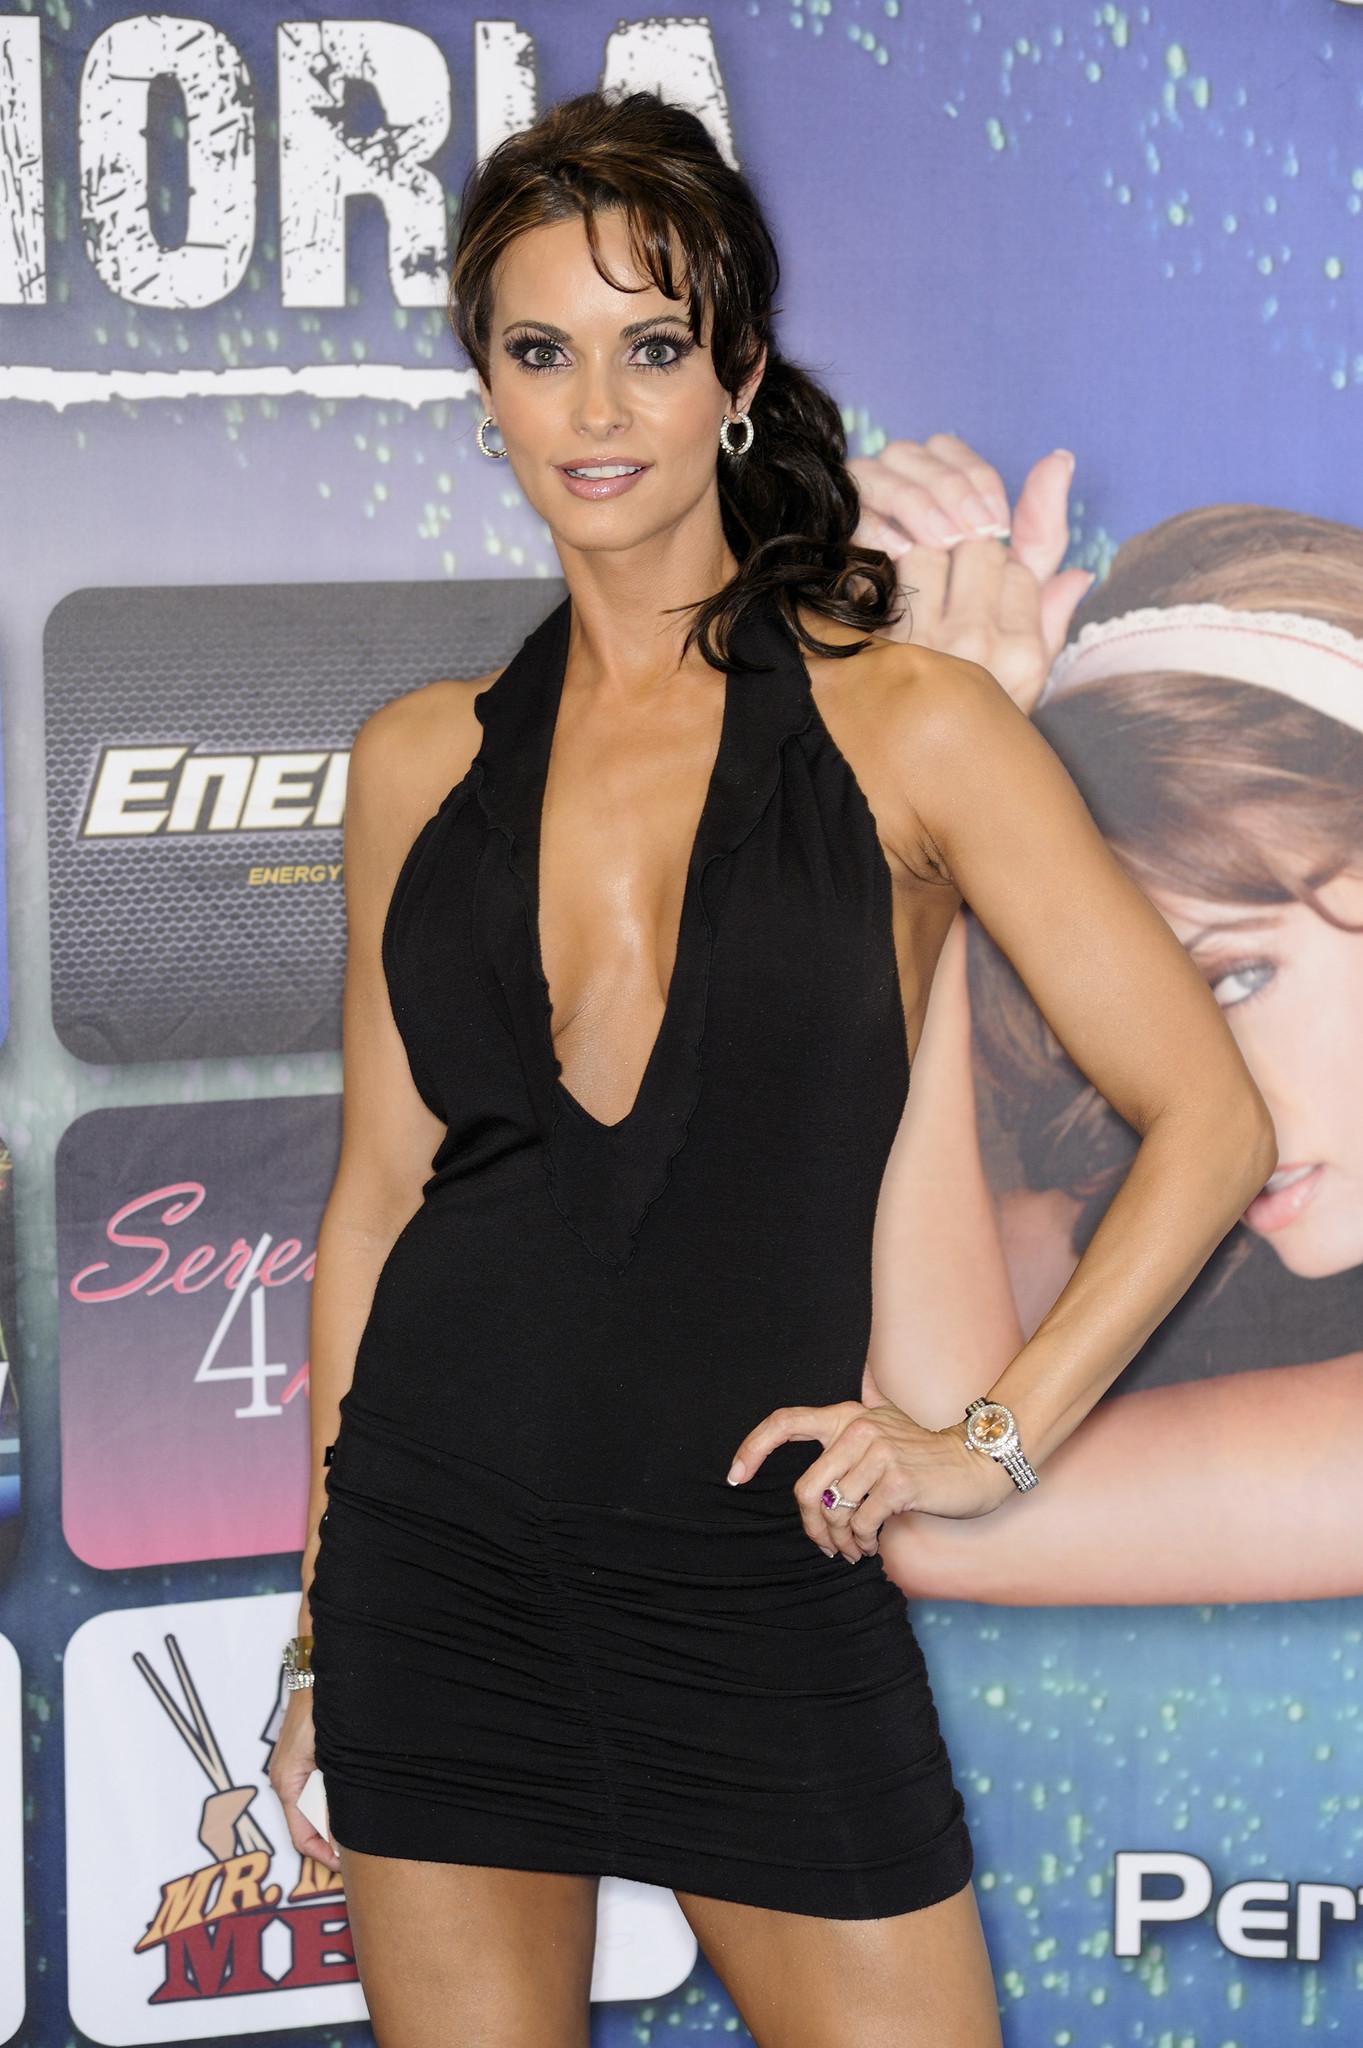 940875ee4f Ex-Playboy model settles lawsuit over Trump hush money - Chicago Tribune